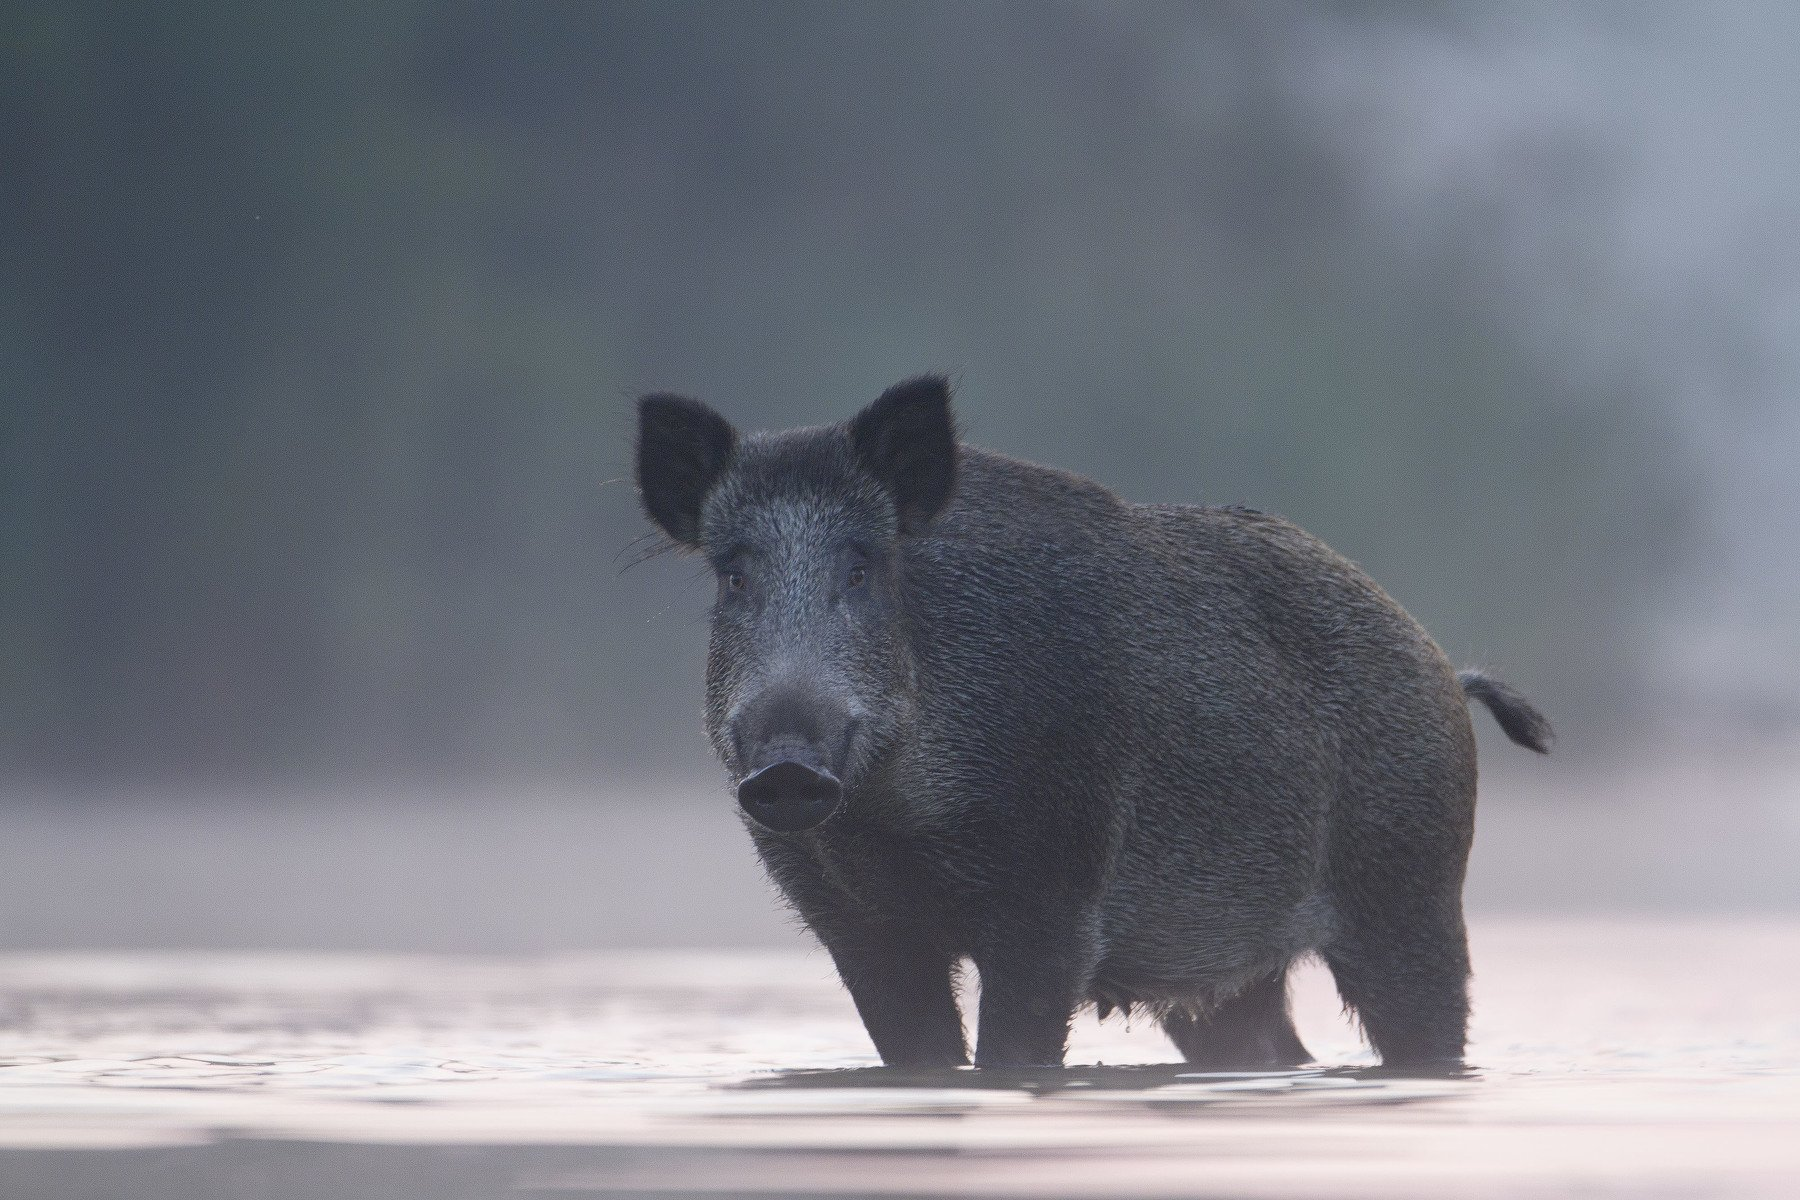 wild boar, mist, sunrise, pond, nature, wildlife, morning, Grzegorz Zimny